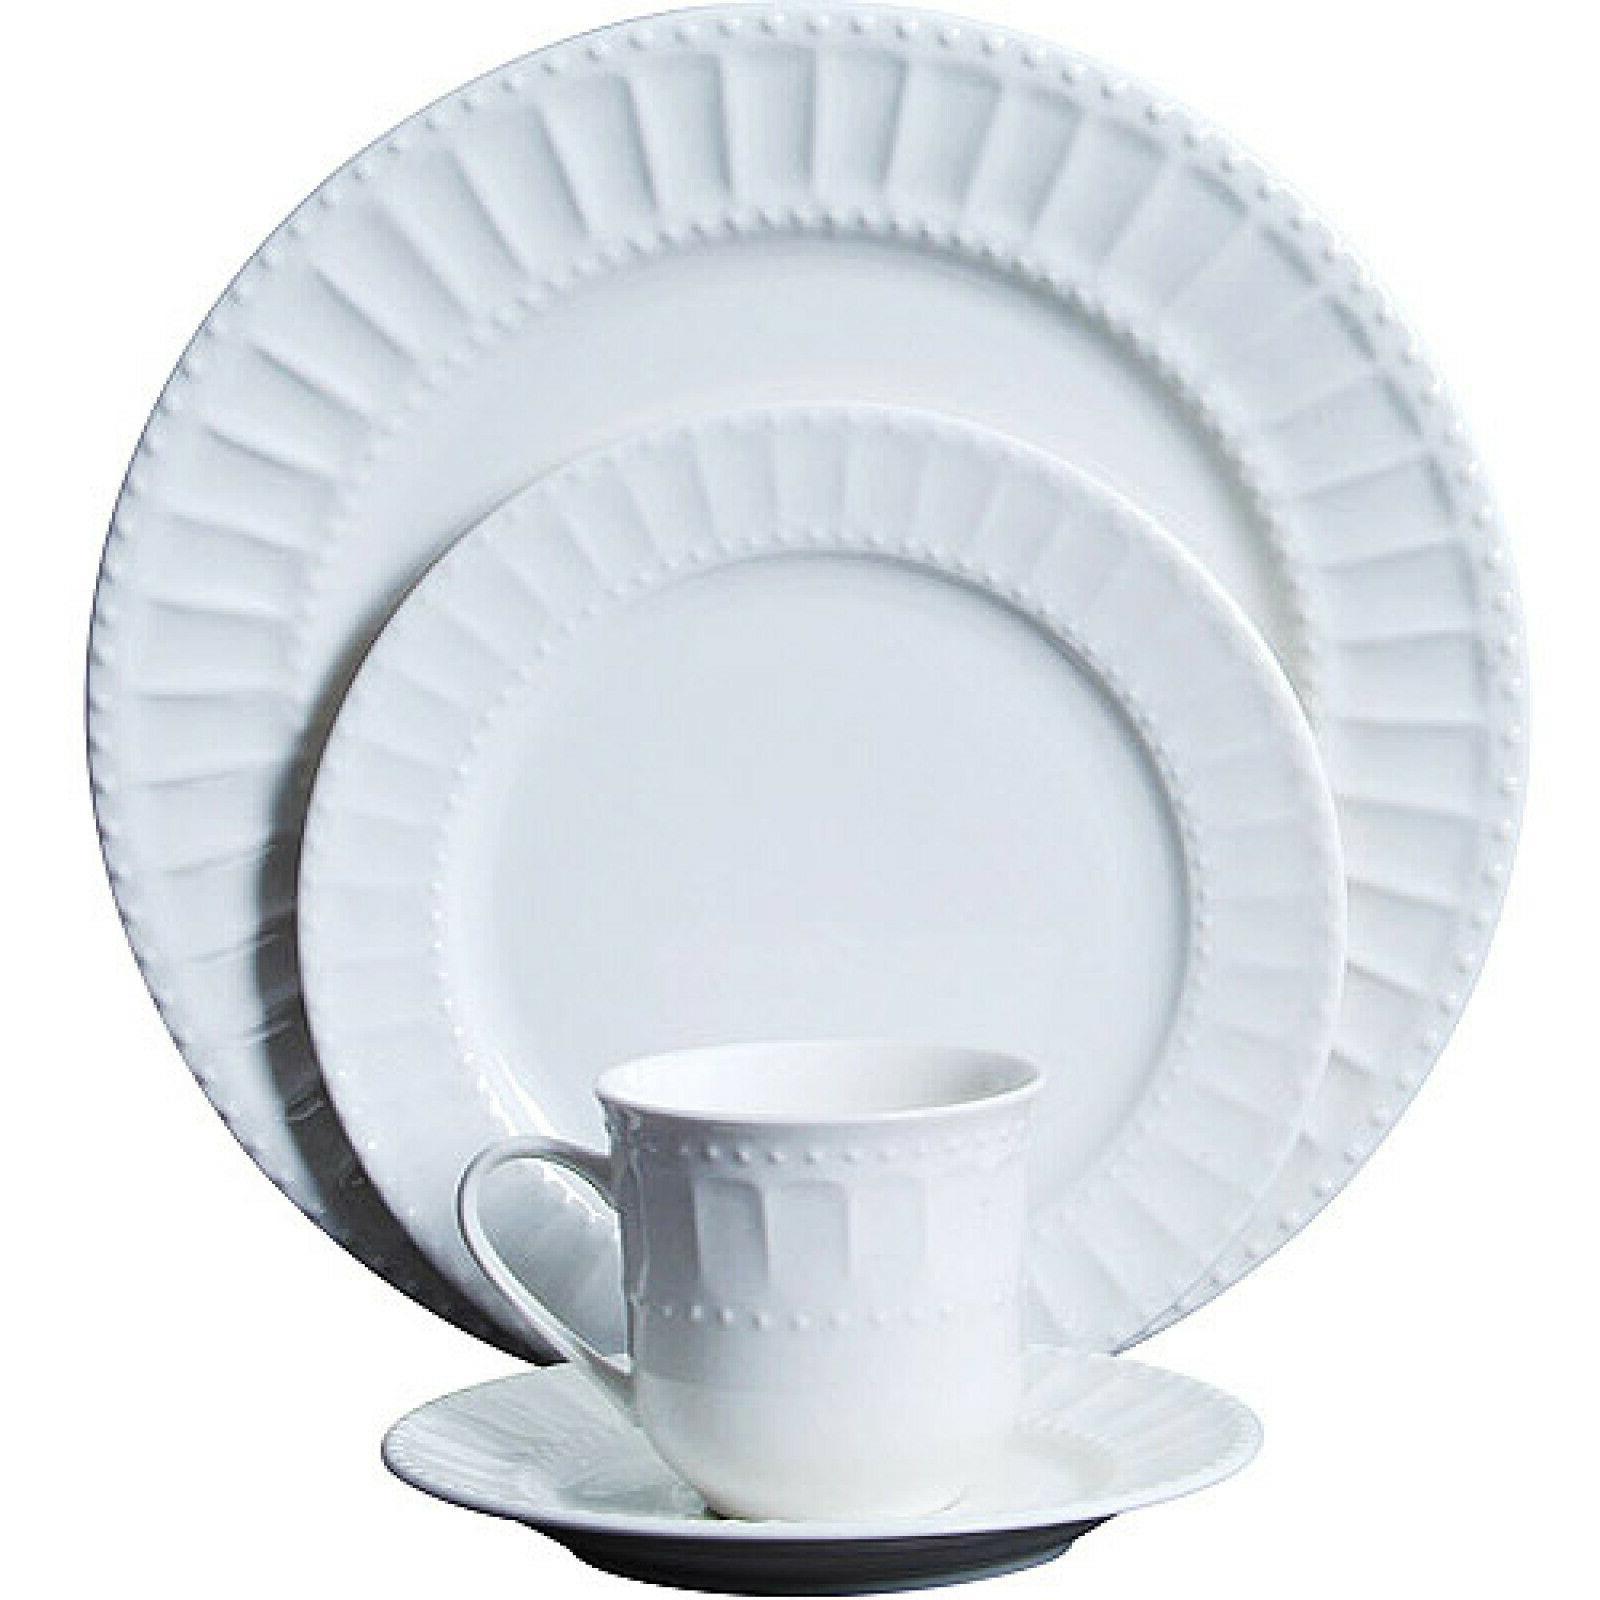 Gibson Dinnerware Service for 6